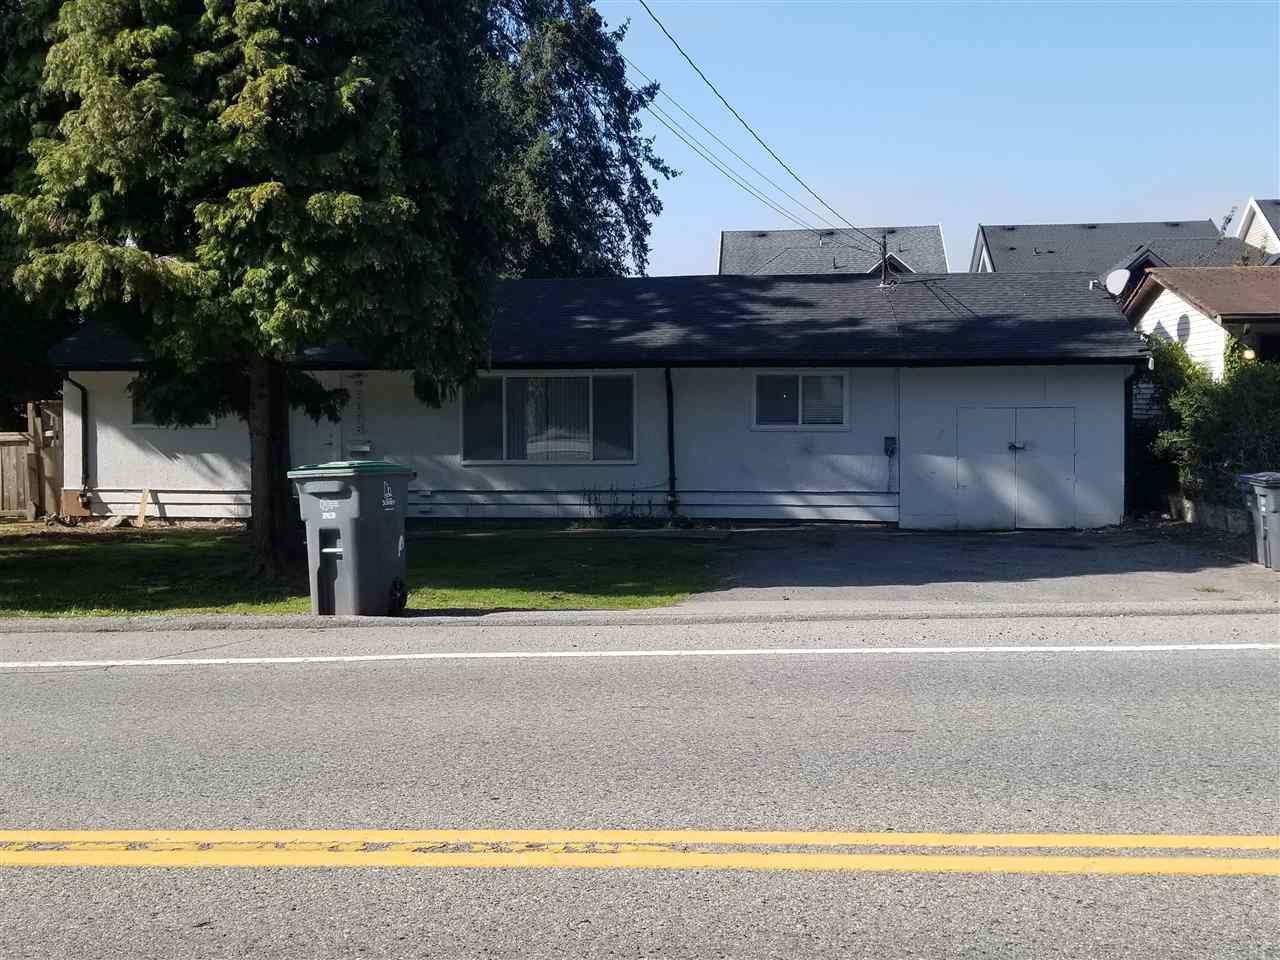 Main Photo: 5855 132 Street in Surrey: Panorama Ridge House for sale : MLS®# R2505795